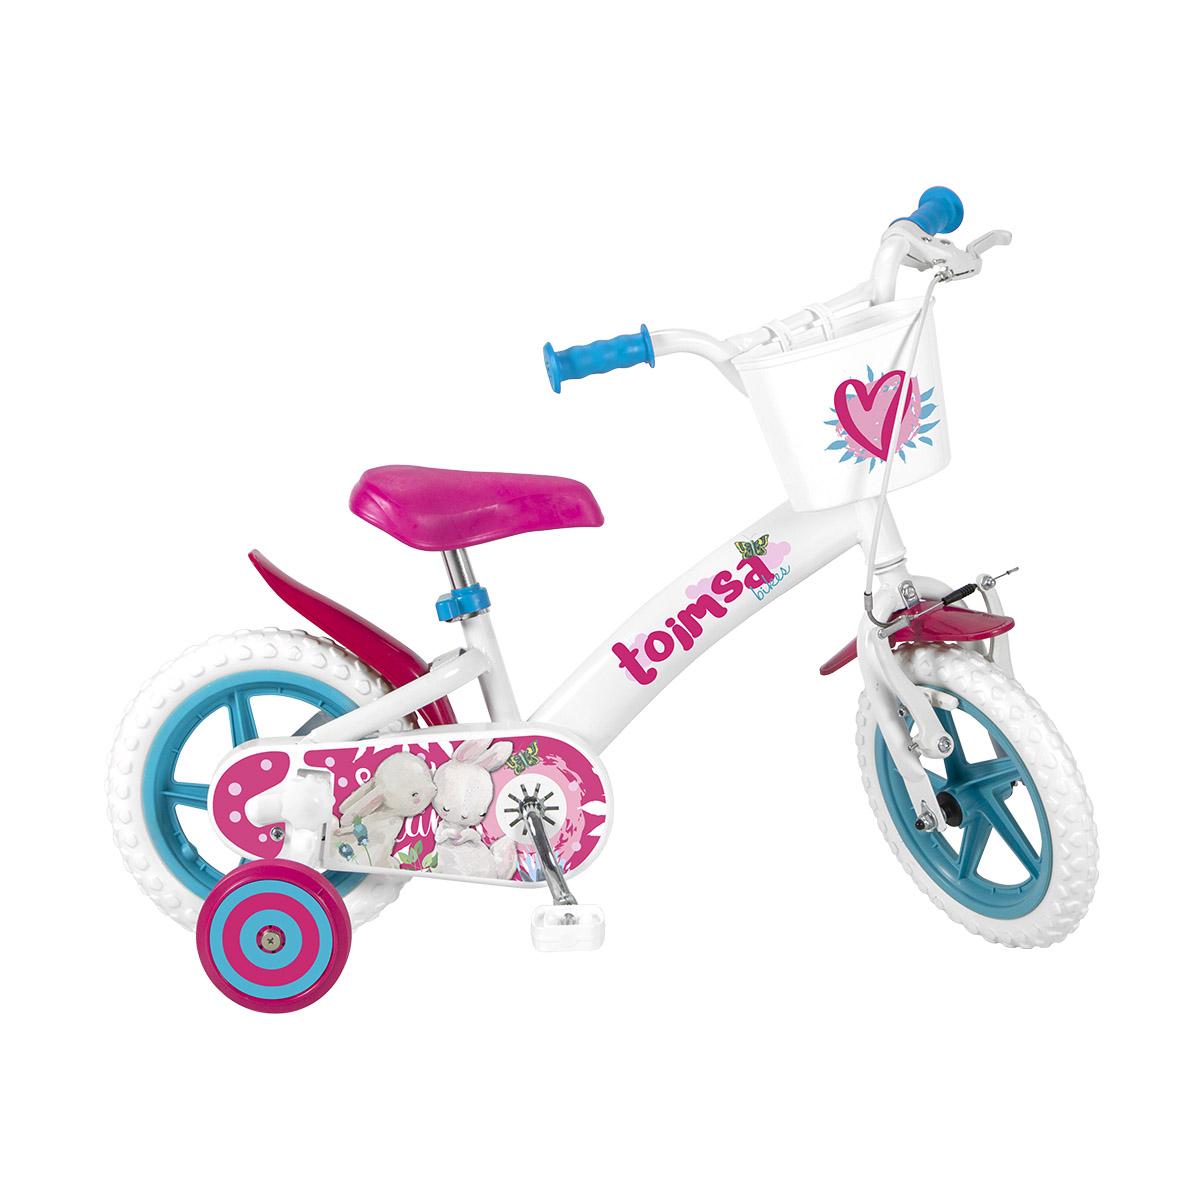 Bicicleta copii Toimsa Rabbit, 12 inch